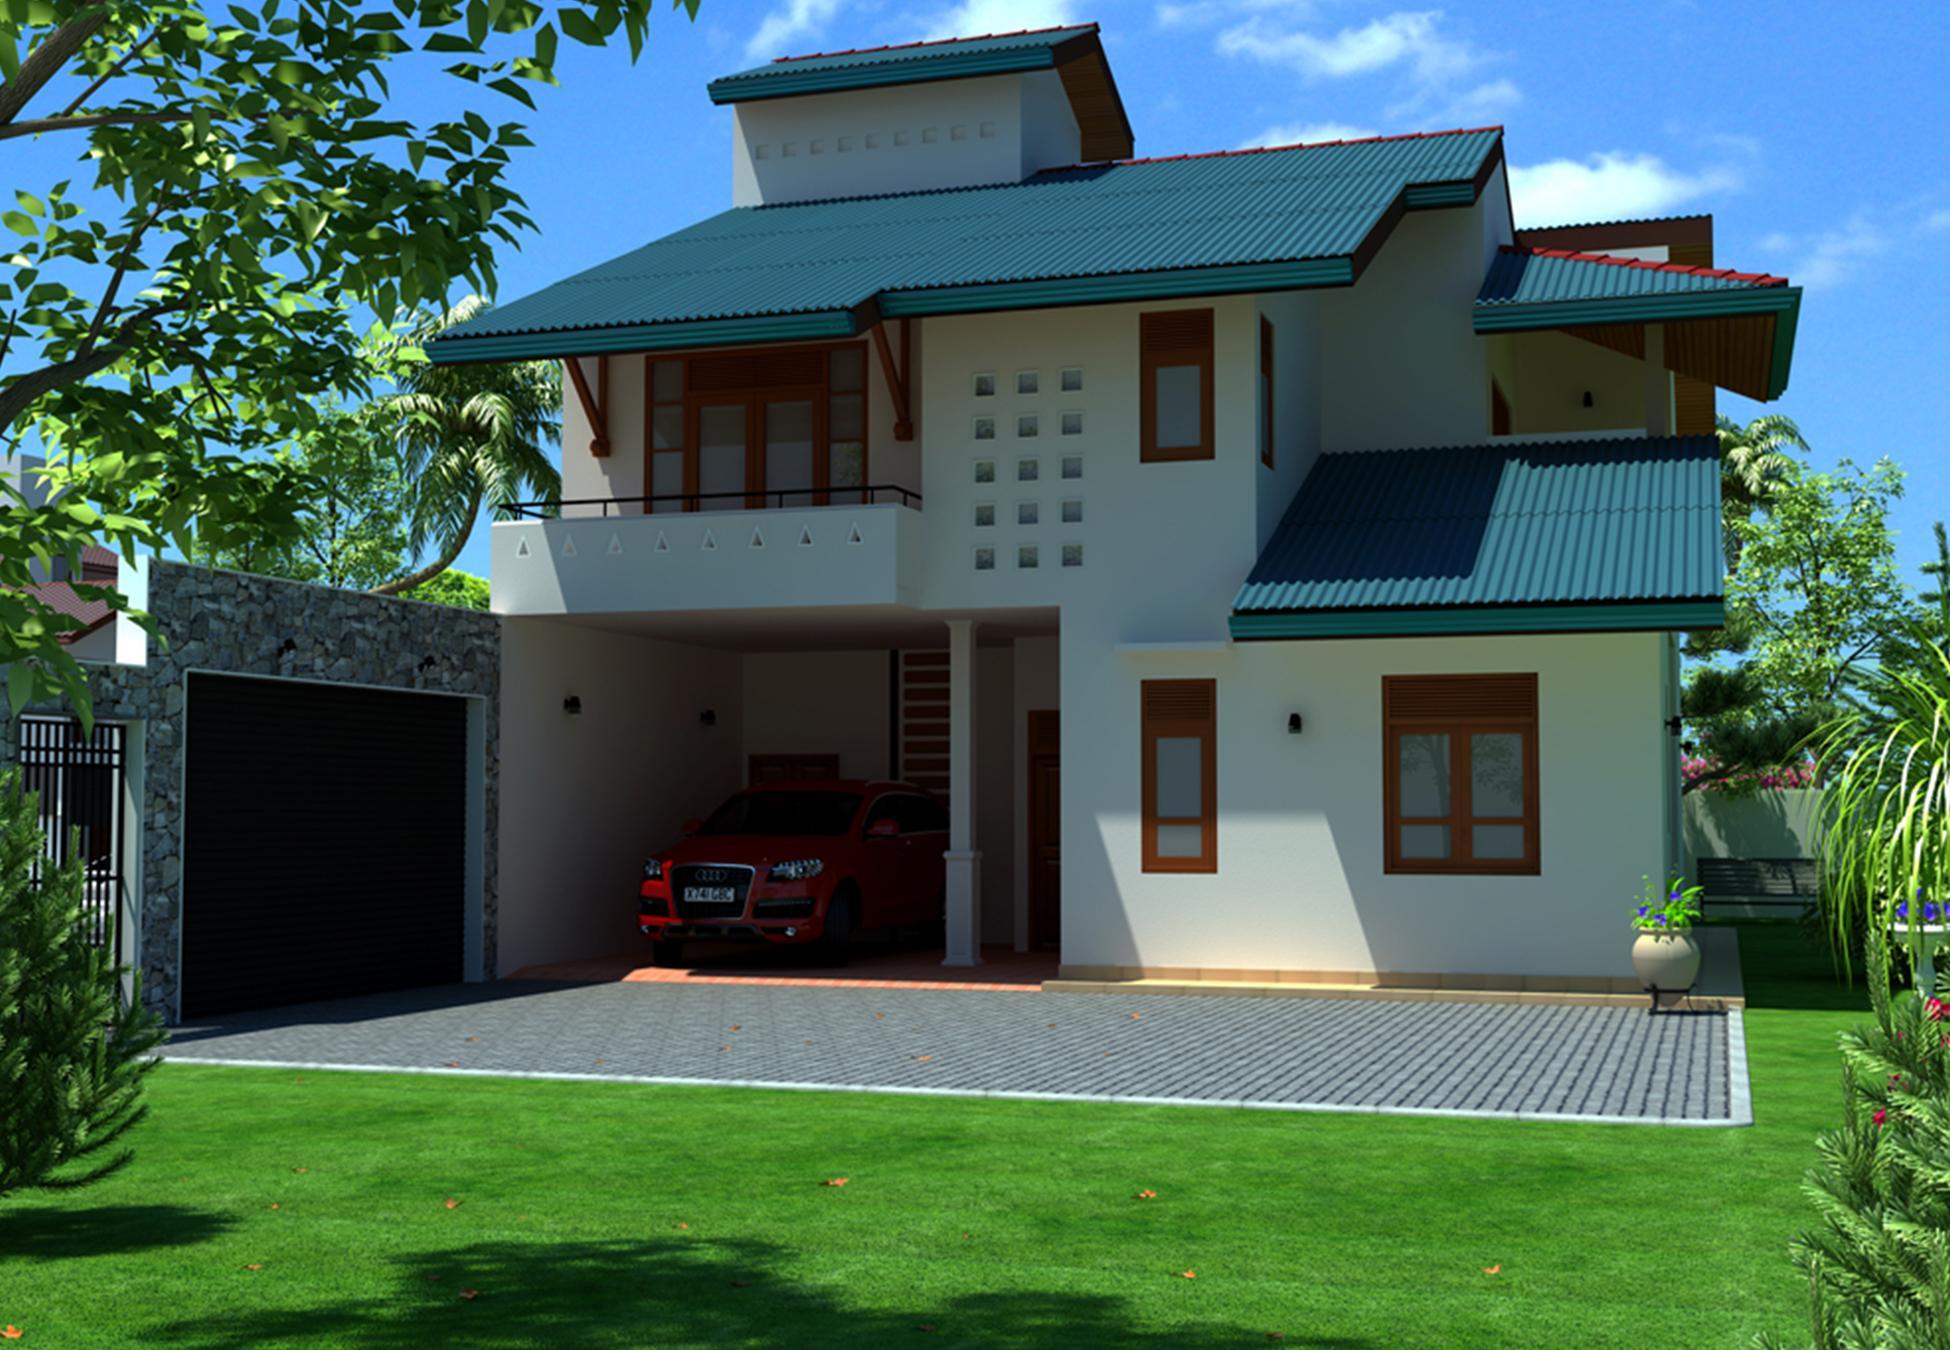 Srilanka house roof design images for New houses plans